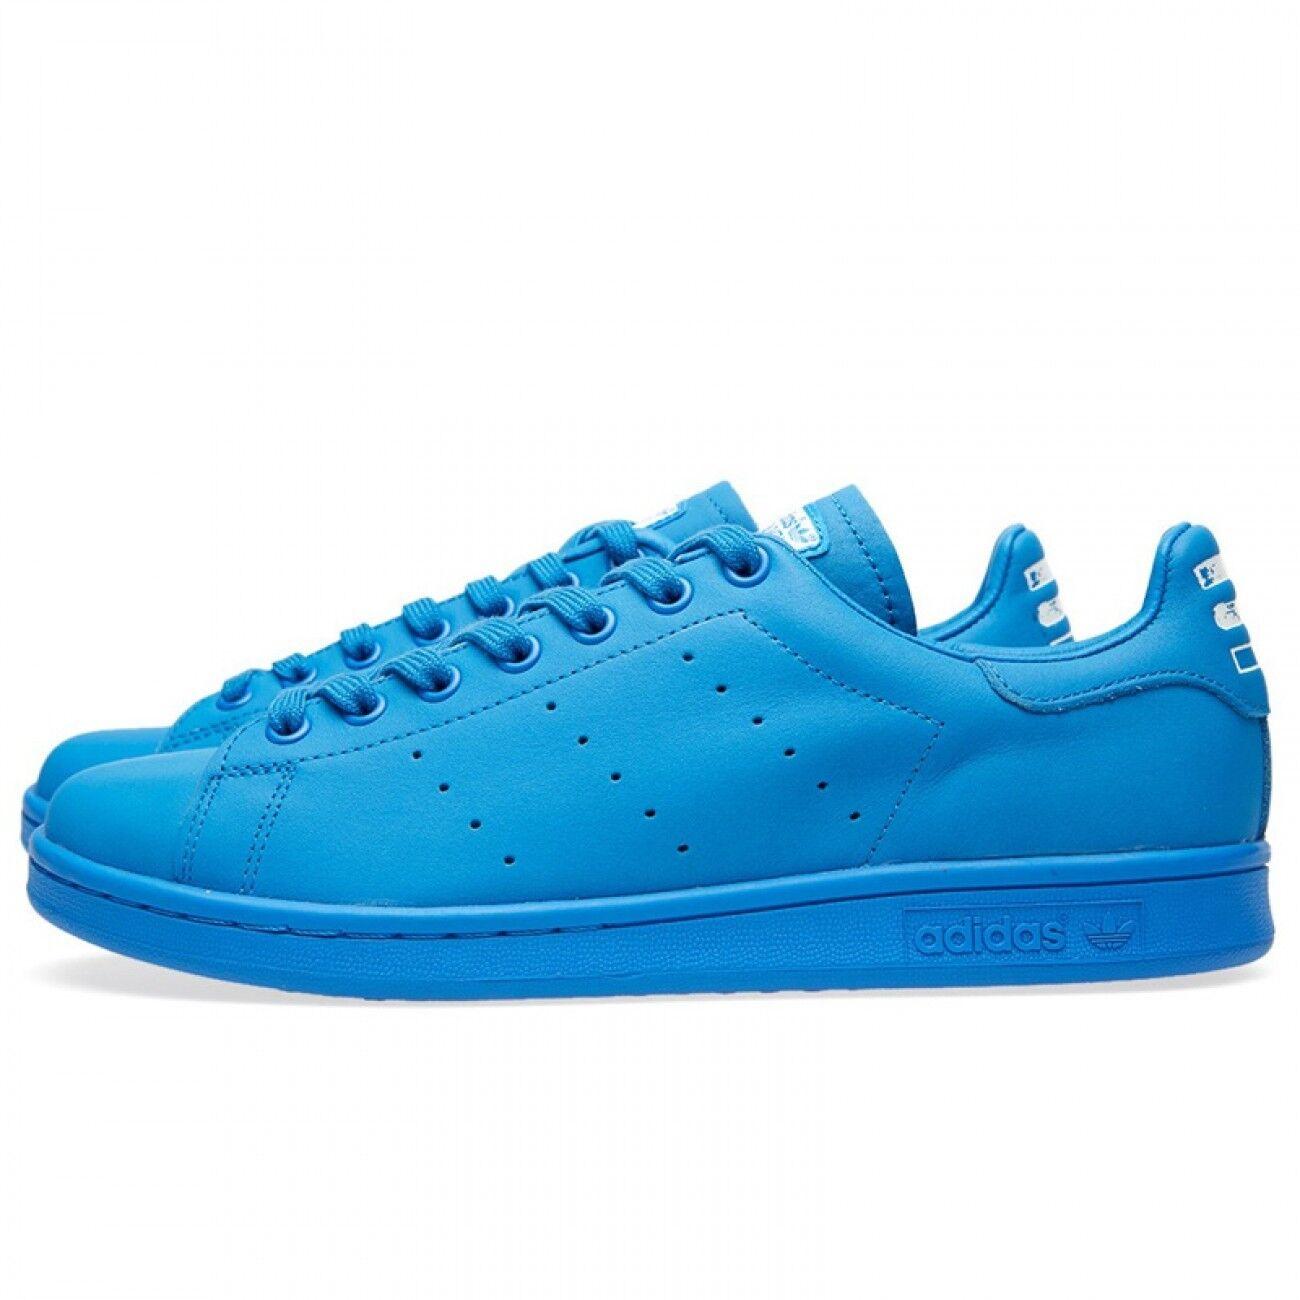 ADIDAS X PHARRELL WILLIAMS STAN SMITH Size 11 BLUE